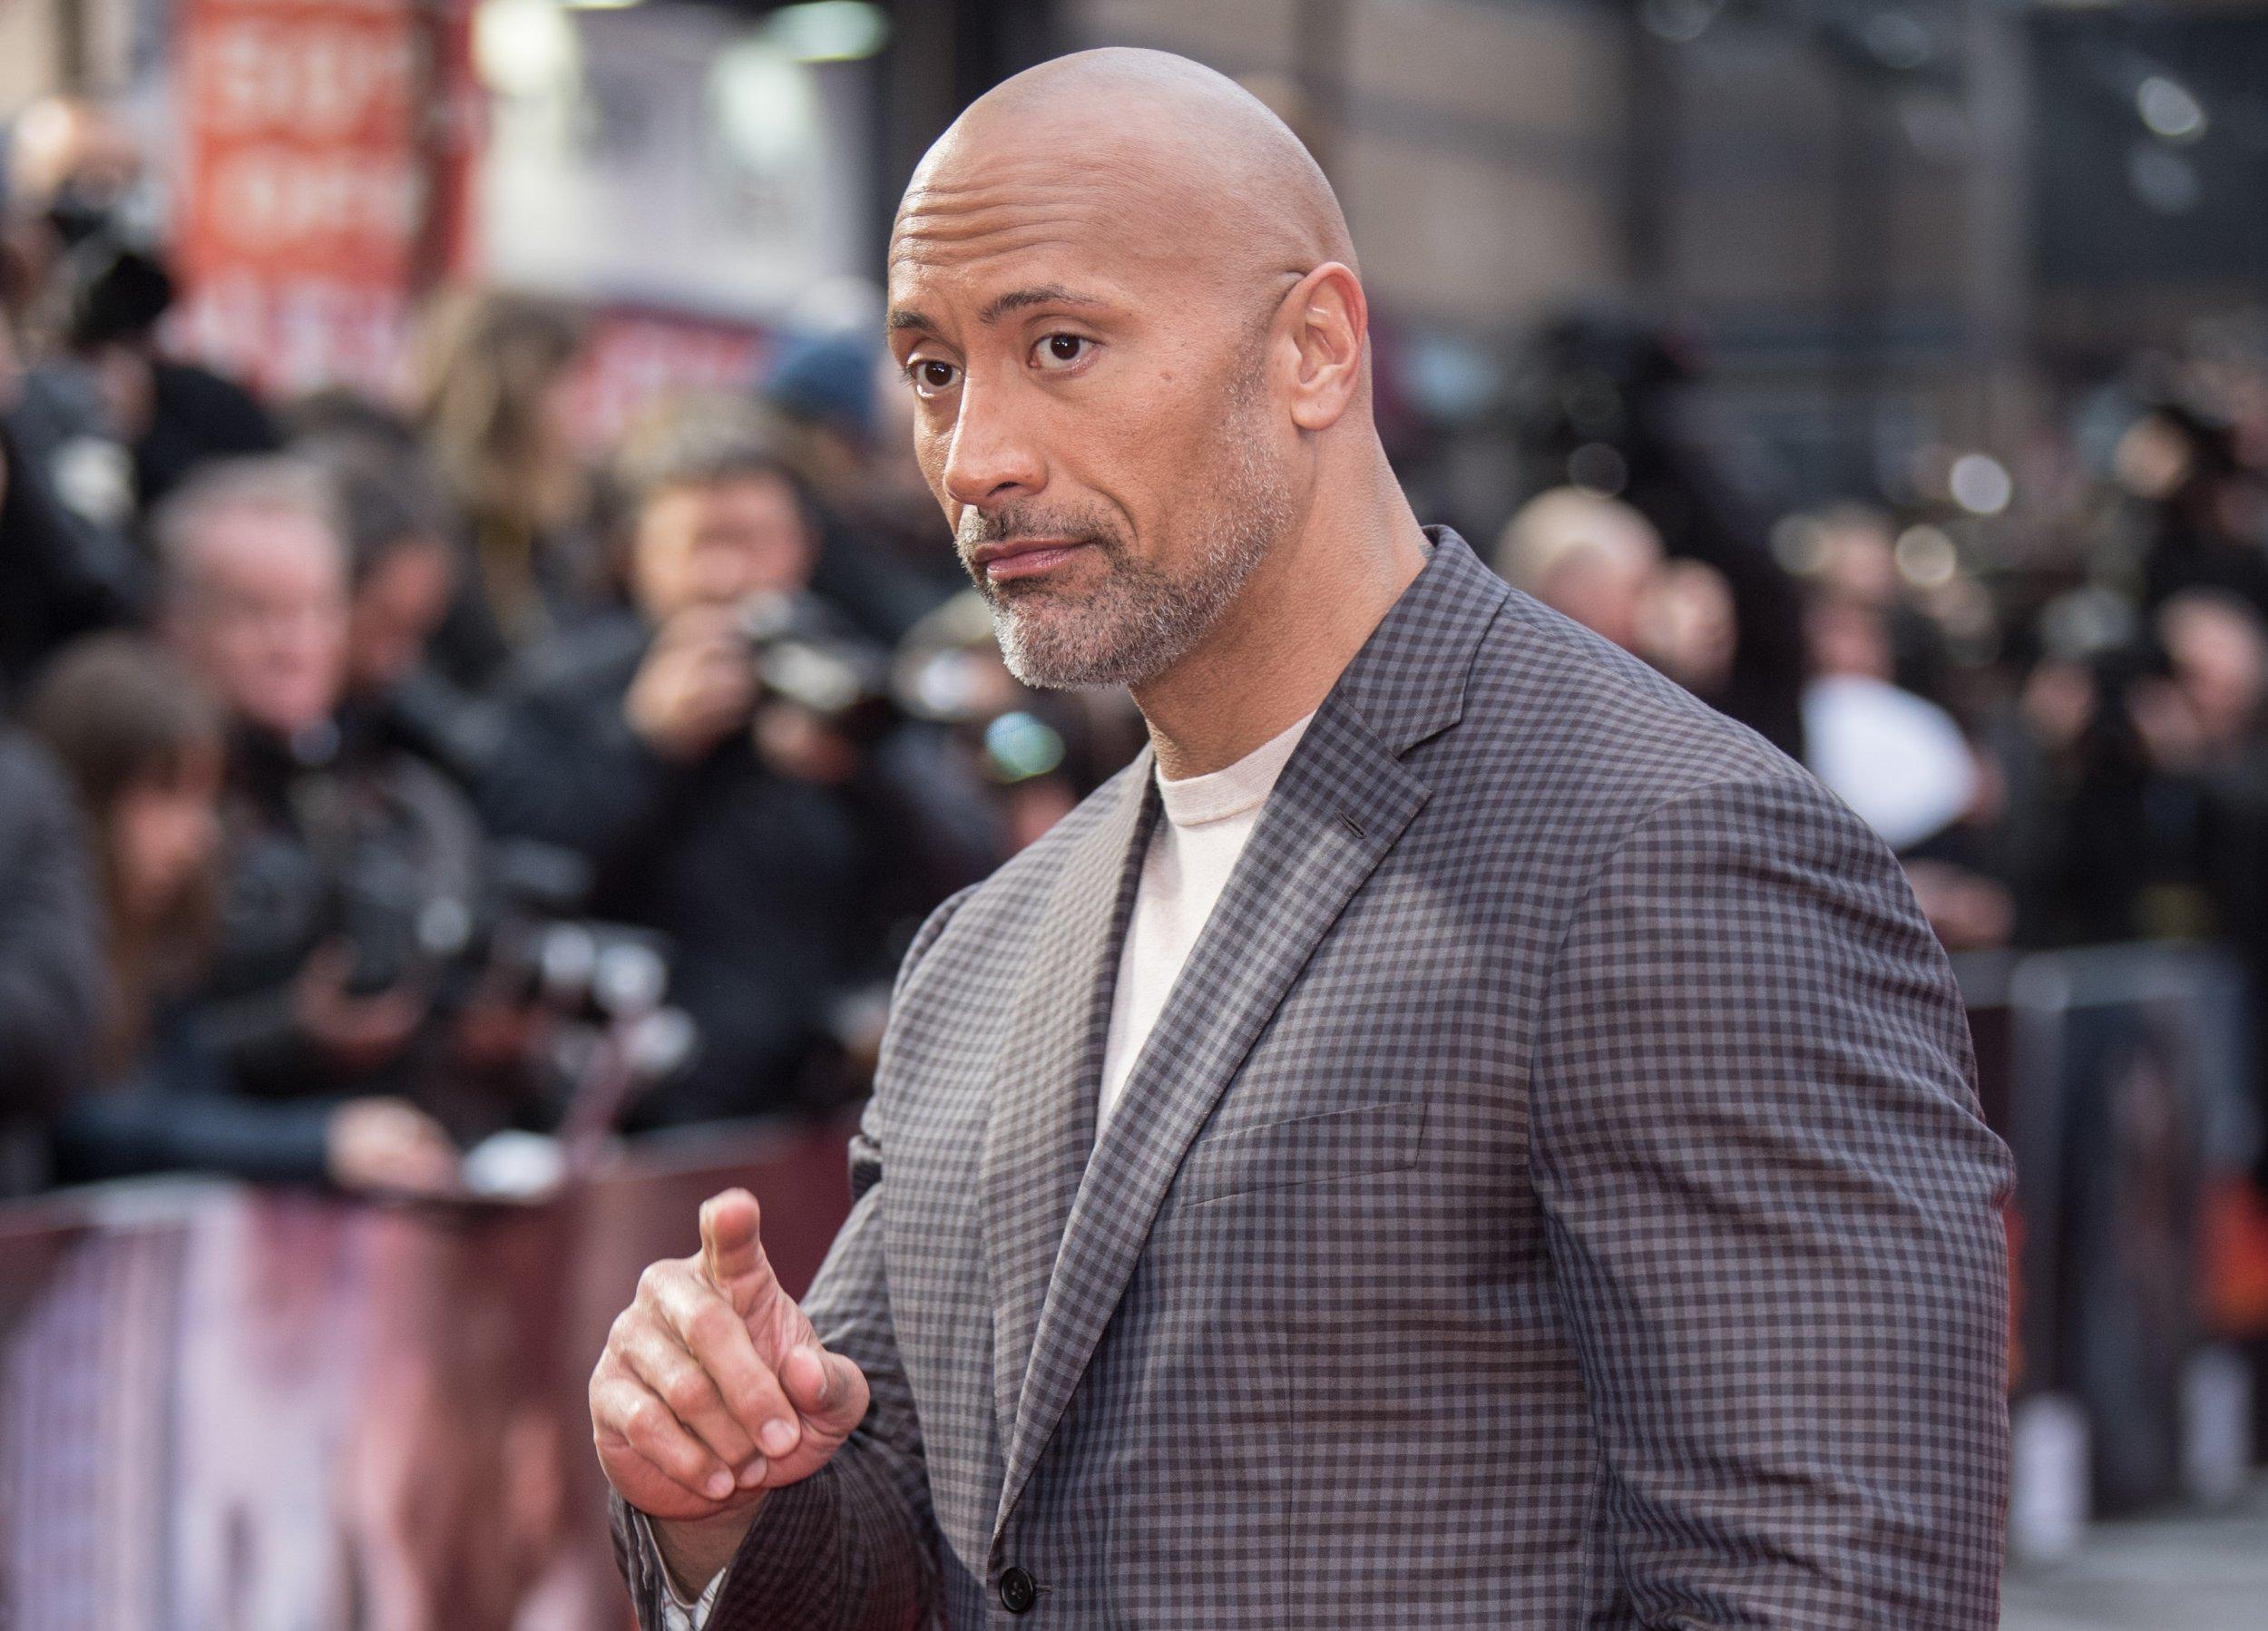 Mandatory Credit: Photo by James Gourley/REX/Shutterstock (9624860cf) Dwayne Johnson 'Rampage' film premiere, London, UK - 11 Apr 2018